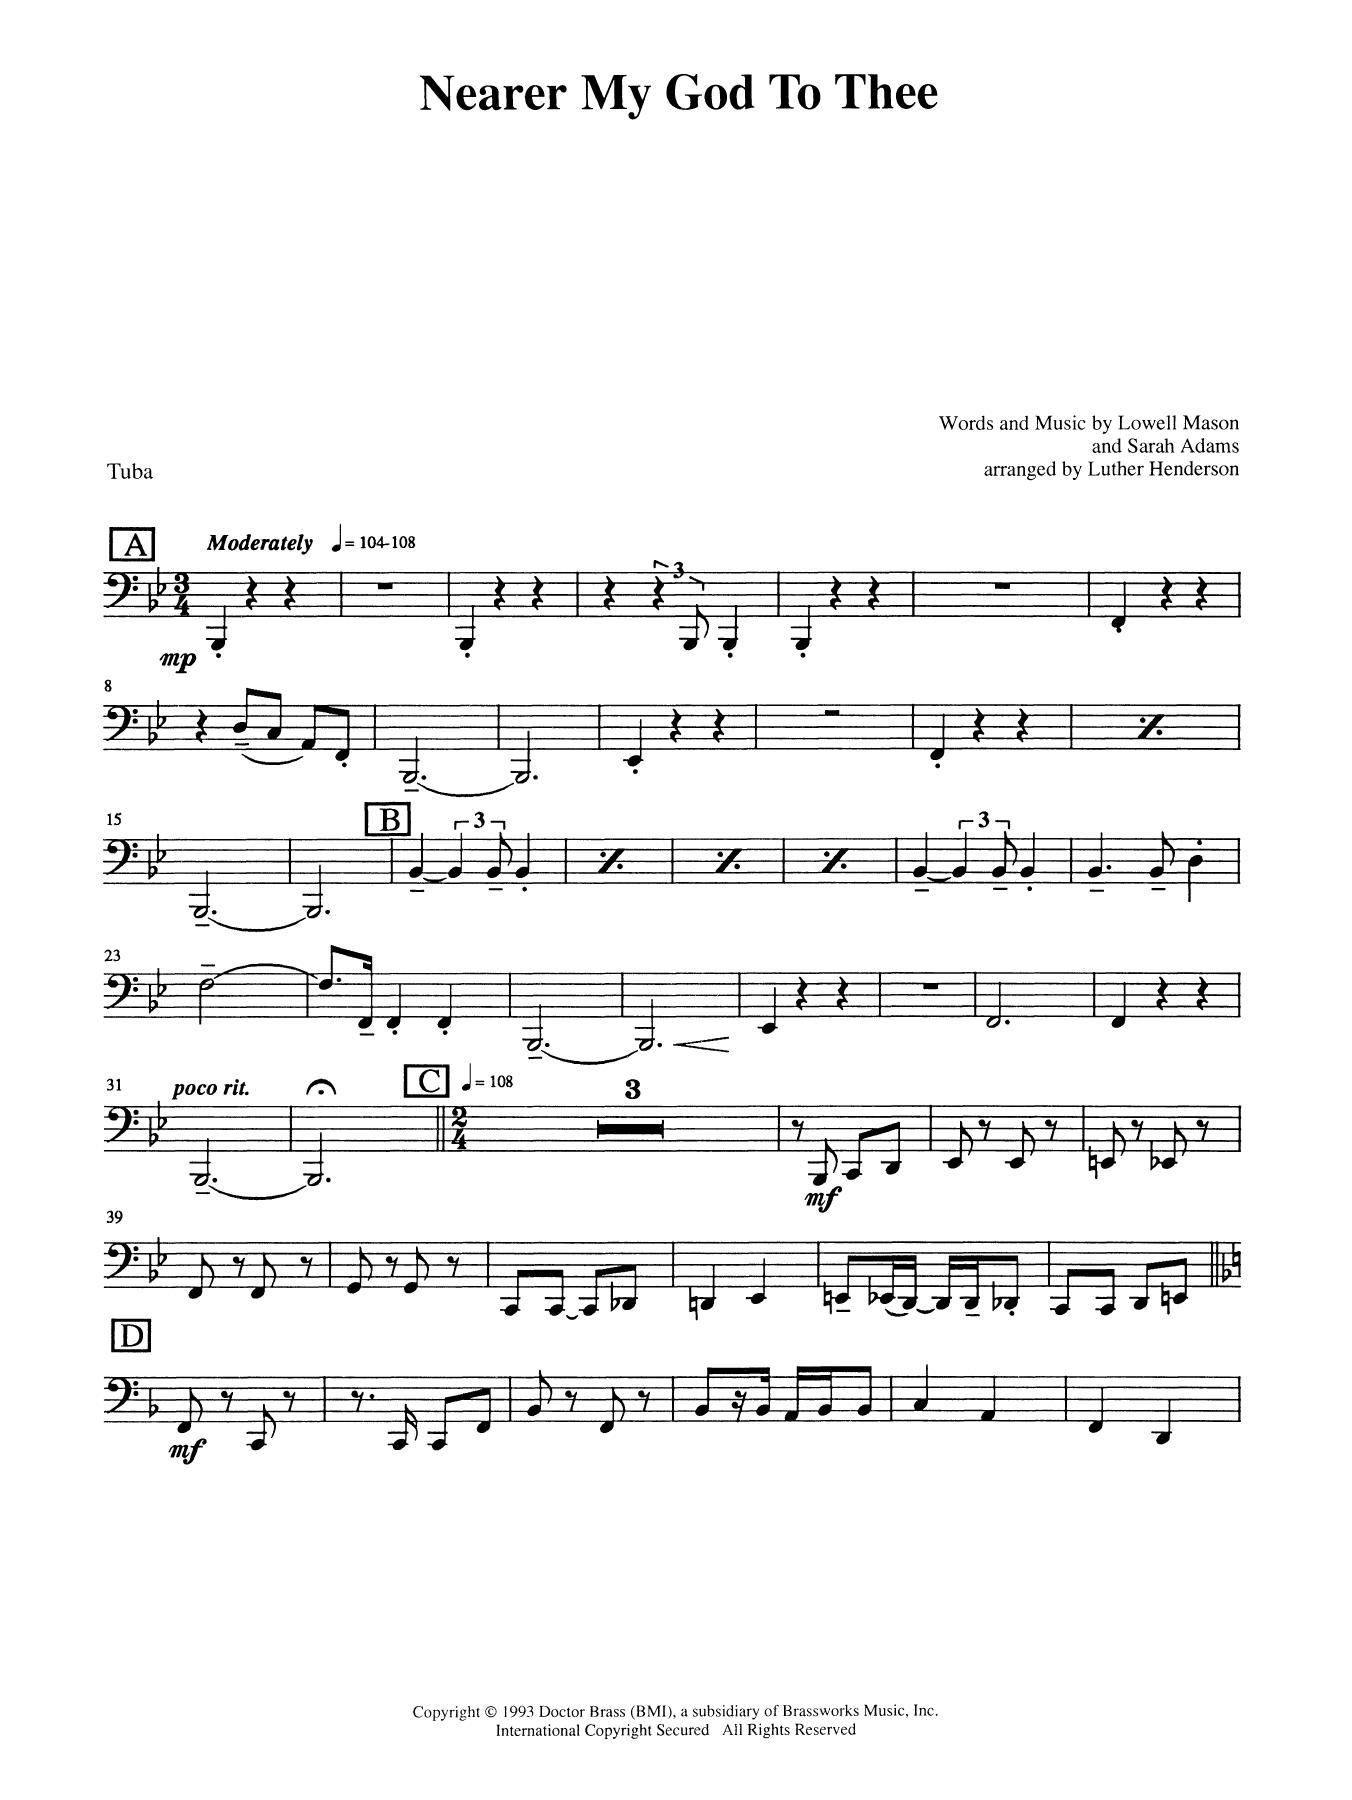 Nearer My God to Thee - Tuba Sheet Music